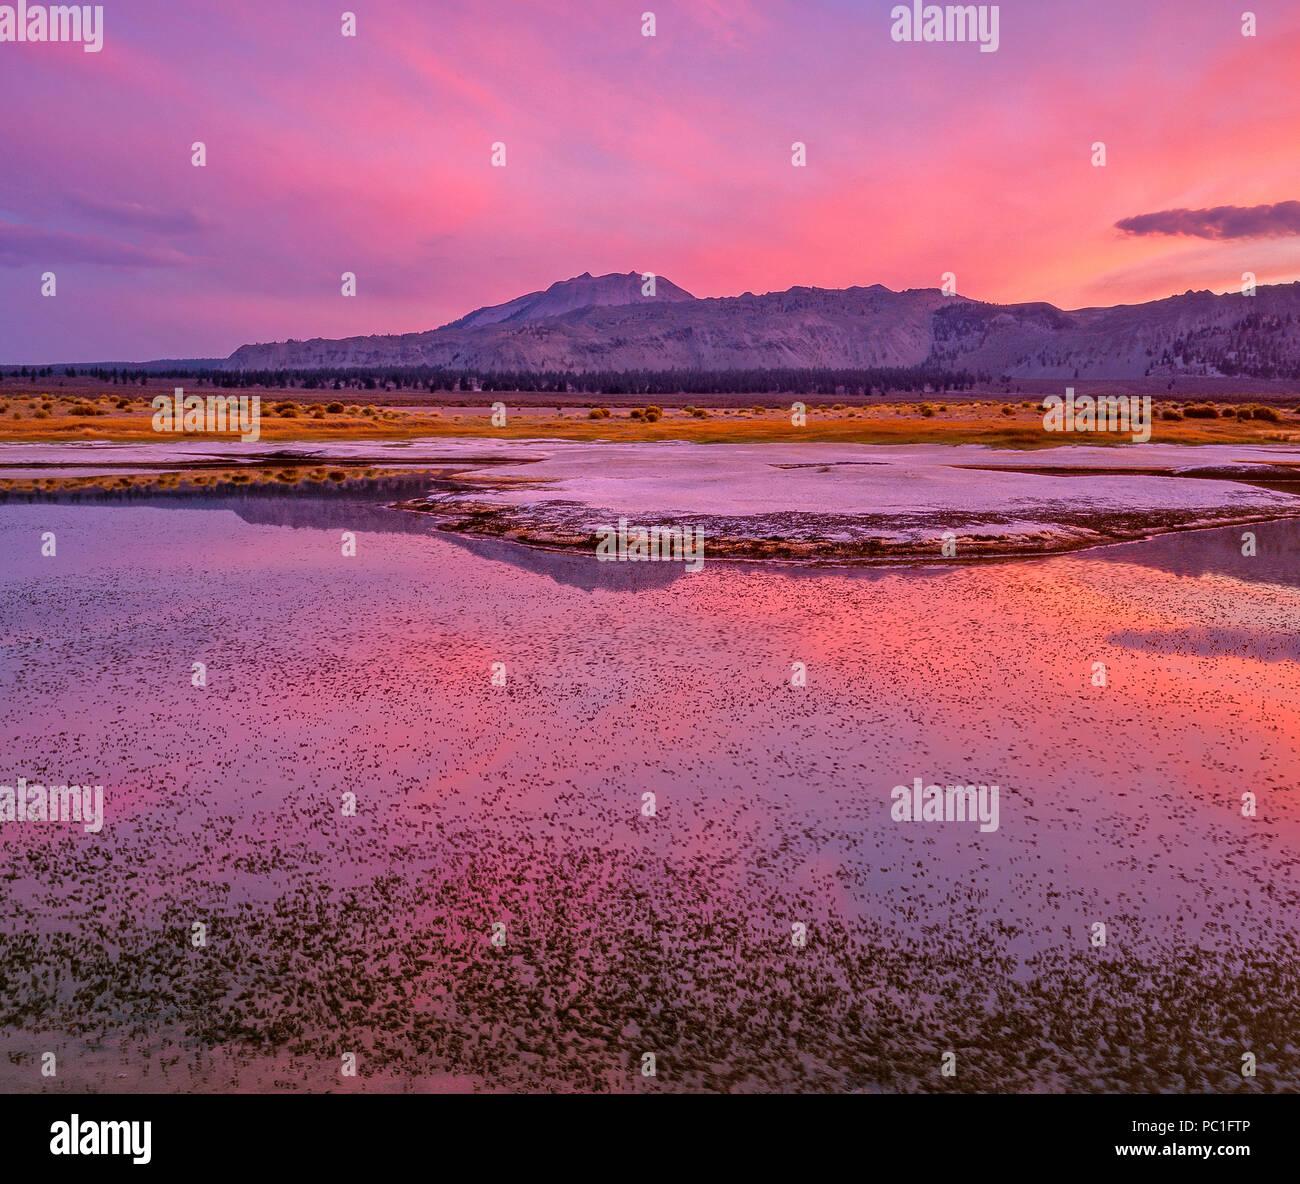 Dämmerung, Brineflies, Feuchtgebiete, Mono Lake, Mono Basin National Forest Scenic Area, Inyo National Forest, Kalifornien Stockbild